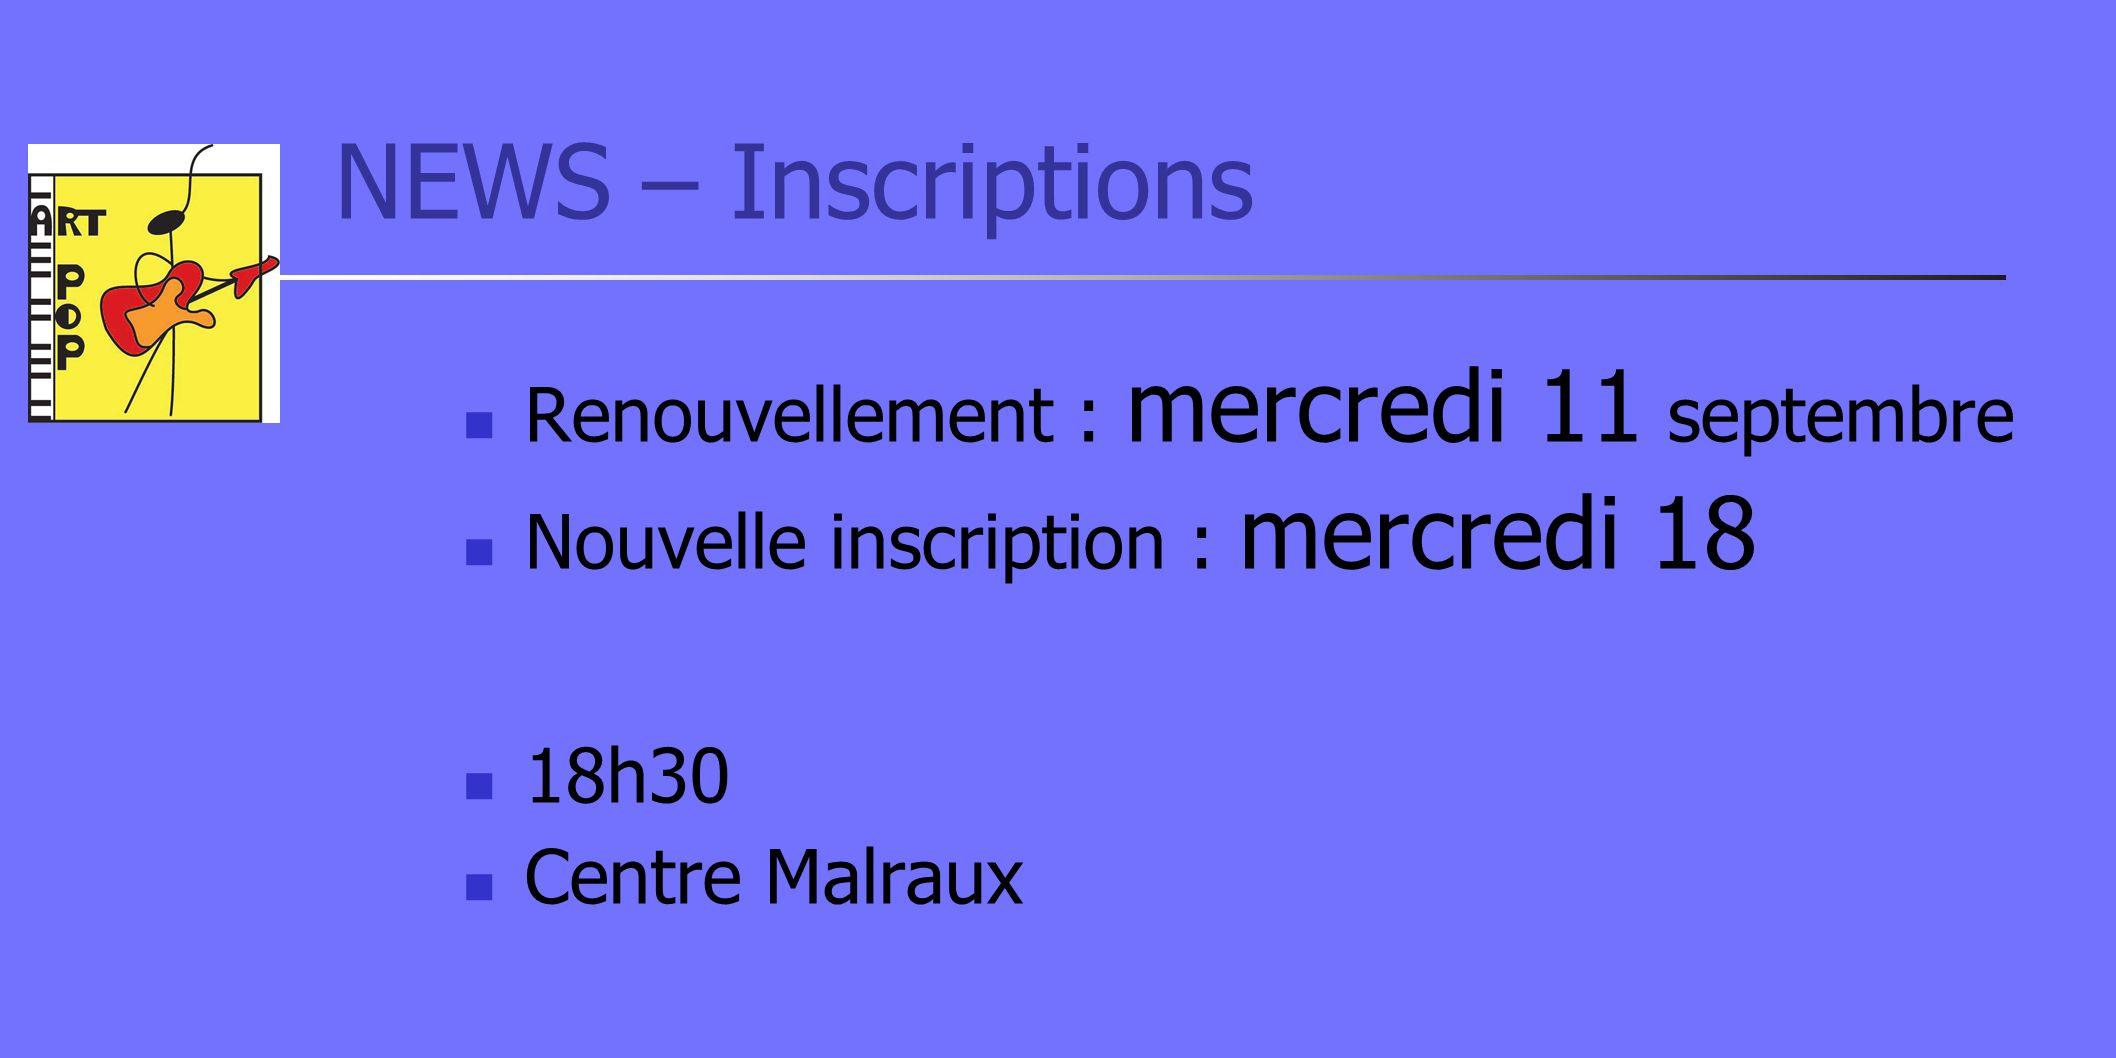 NEWS – Inscriptions Renouvellement : mercredi 11 septembre Nouvelle inscription : mercredi 18 18h30 Centre Malraux